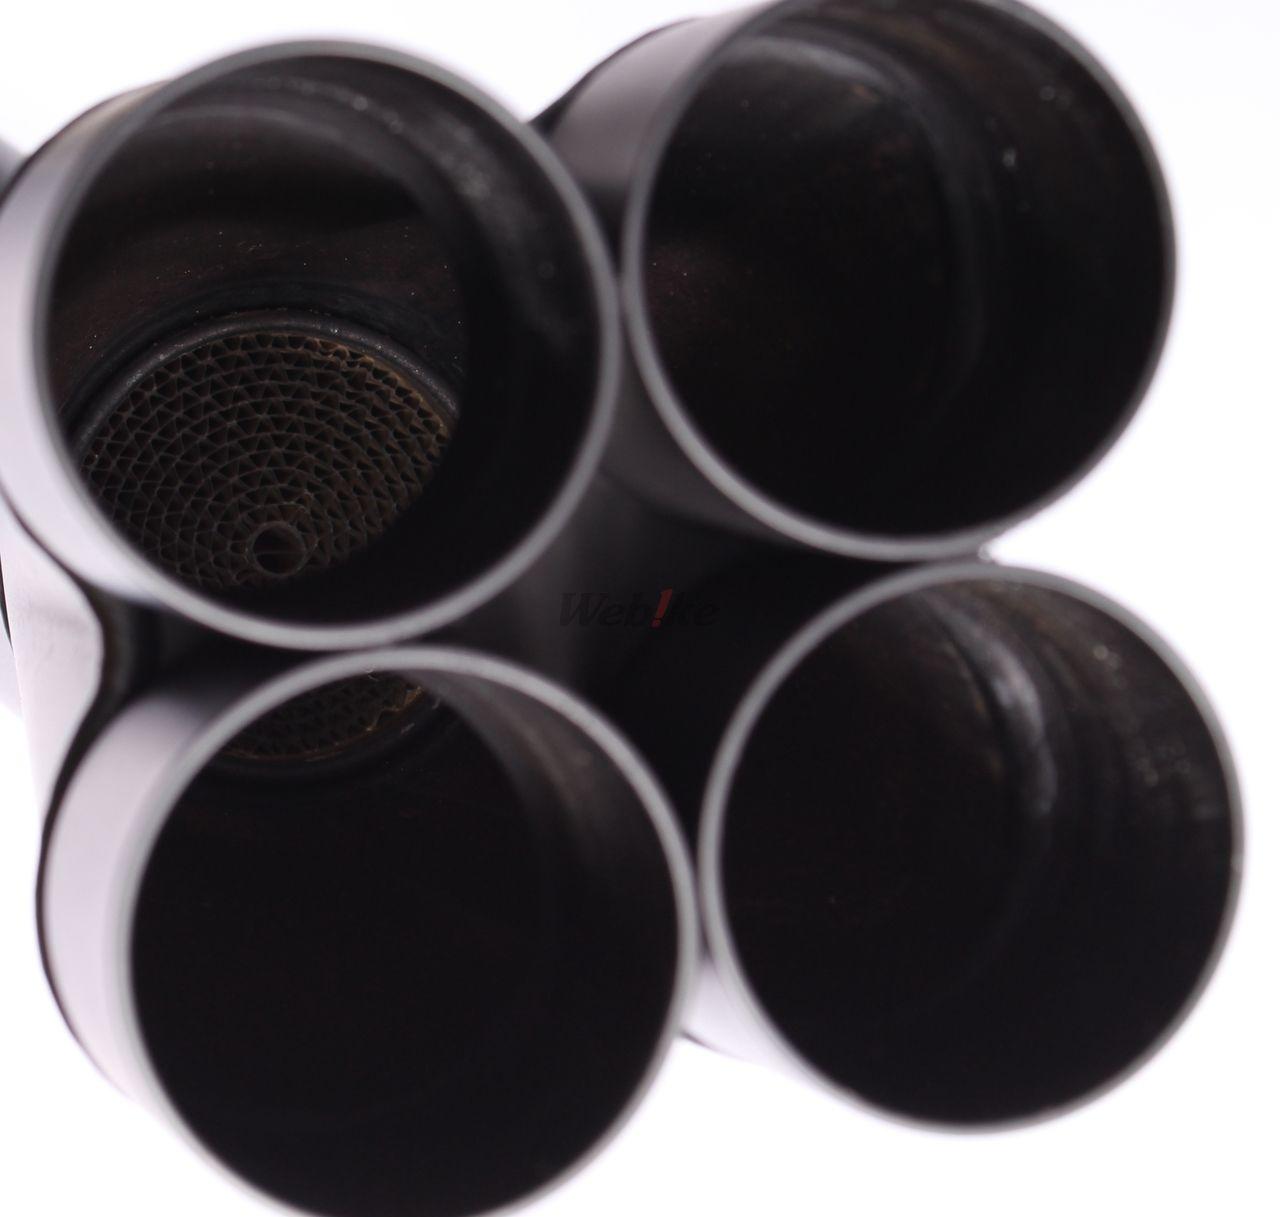 【MORIWAKI】MONSTER 全段排氣管 黑色 - 「Webike-摩托百貨」